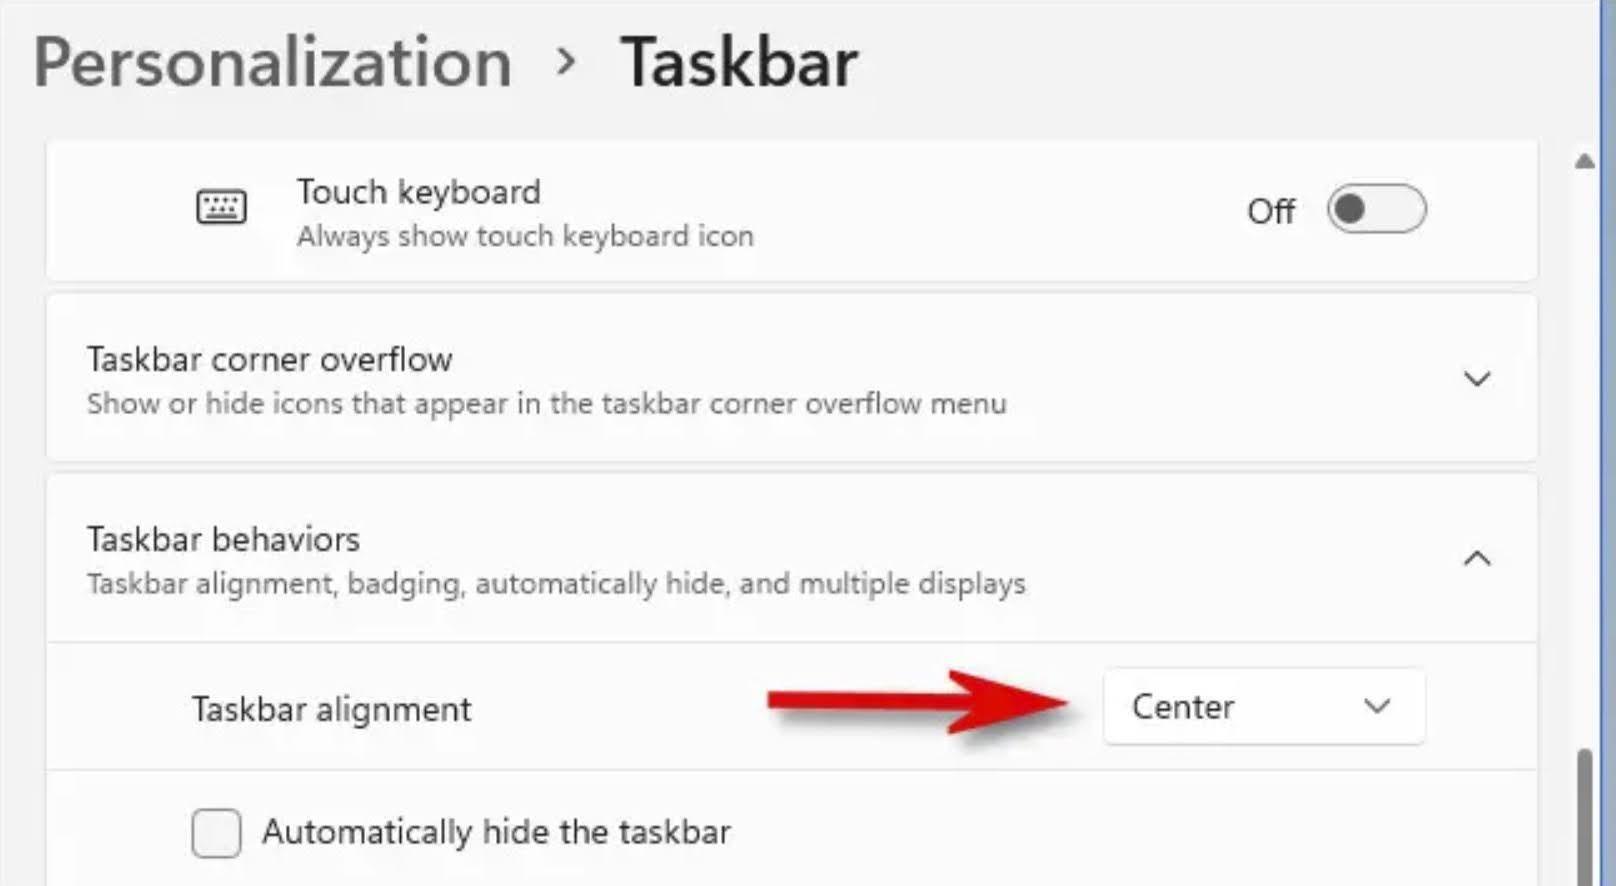 Click the drop-down menu beside Taskbar Alignment.